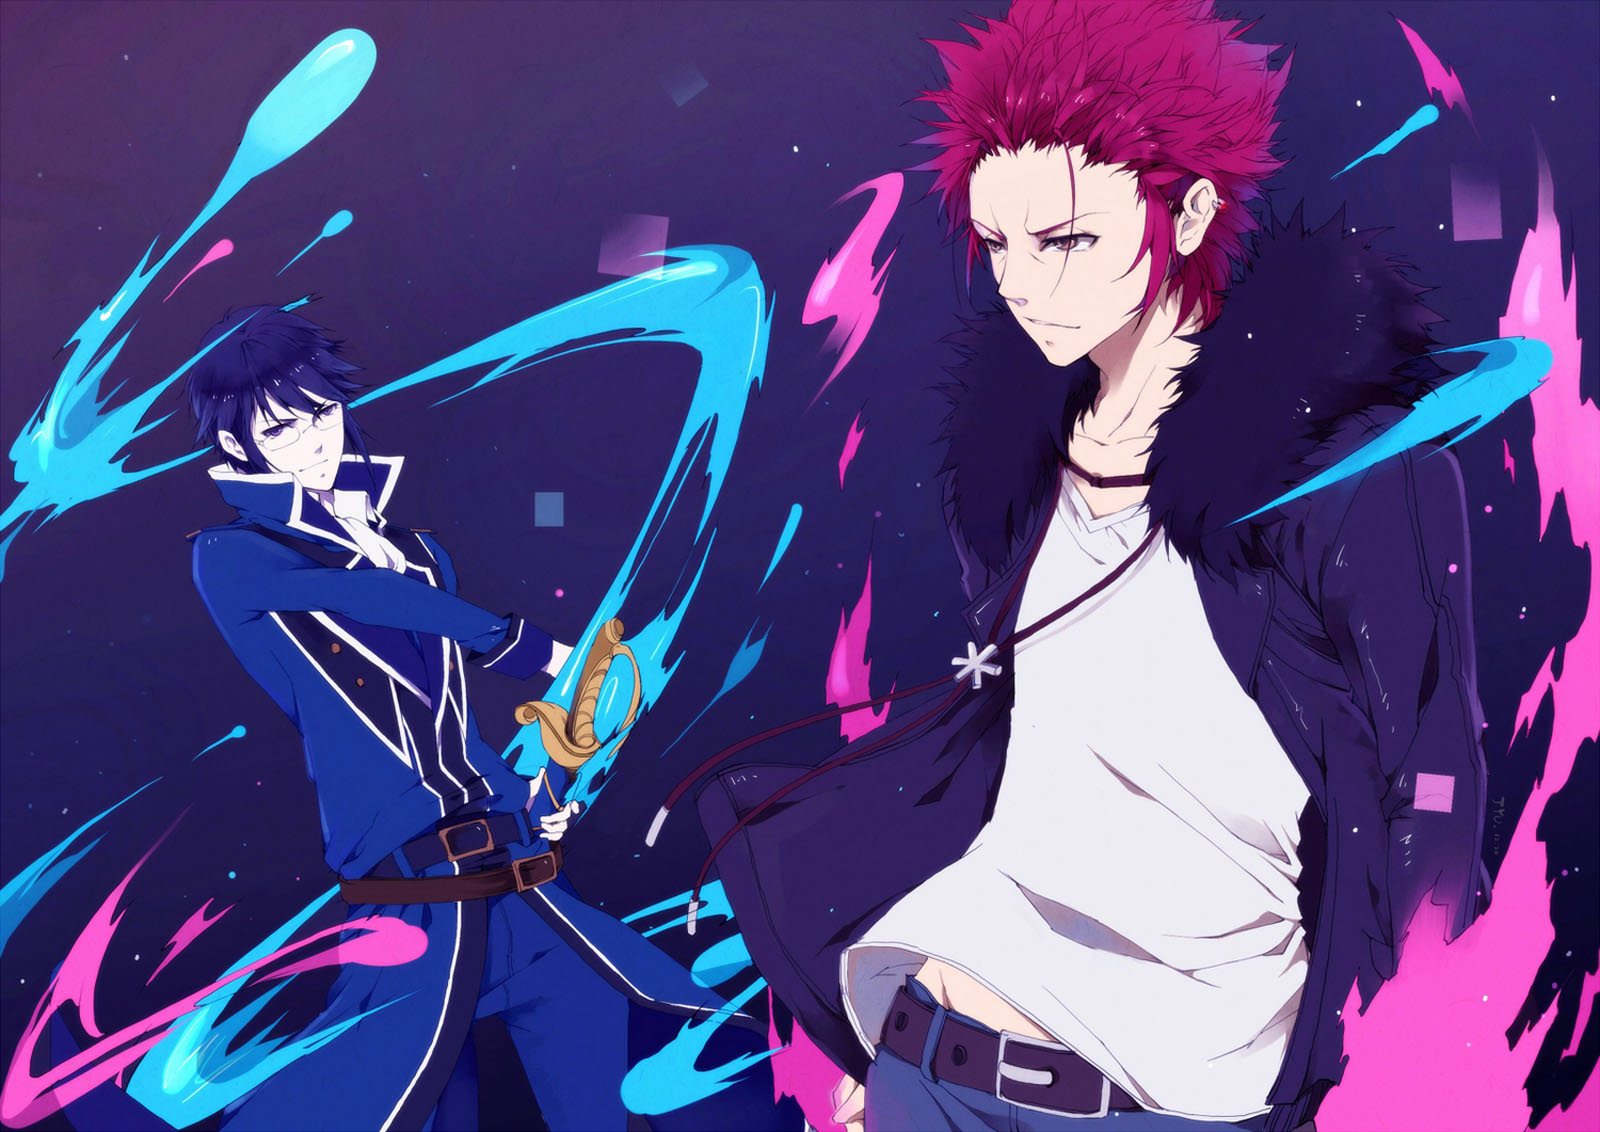 Project Mikoto Suoh Reisi Munakata Anime HD Wallpaper Desktop PC 1600x1132